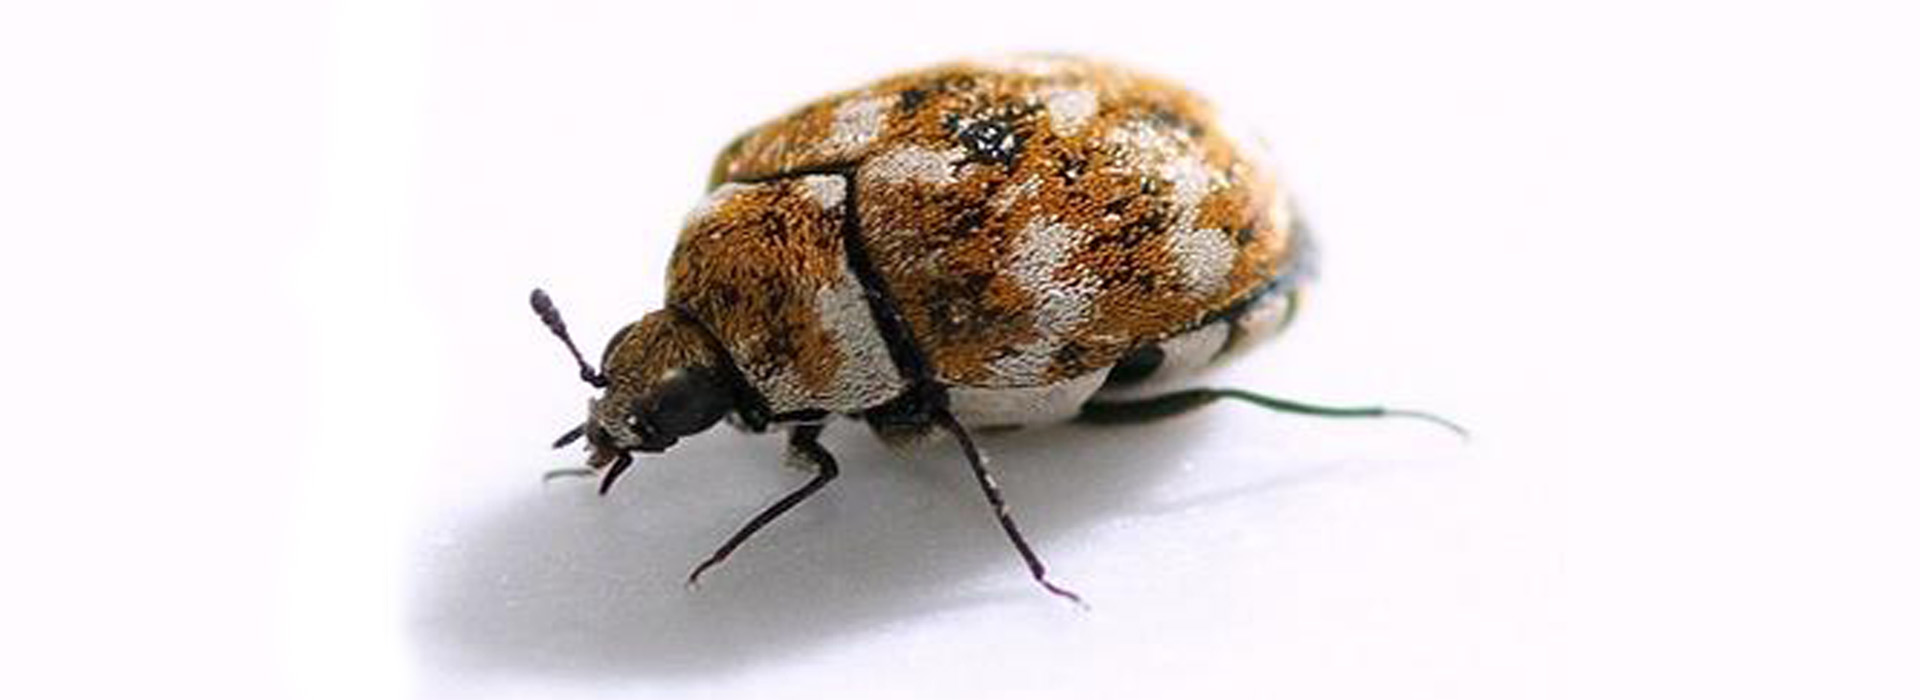 Close up photograph of a carpet beetle